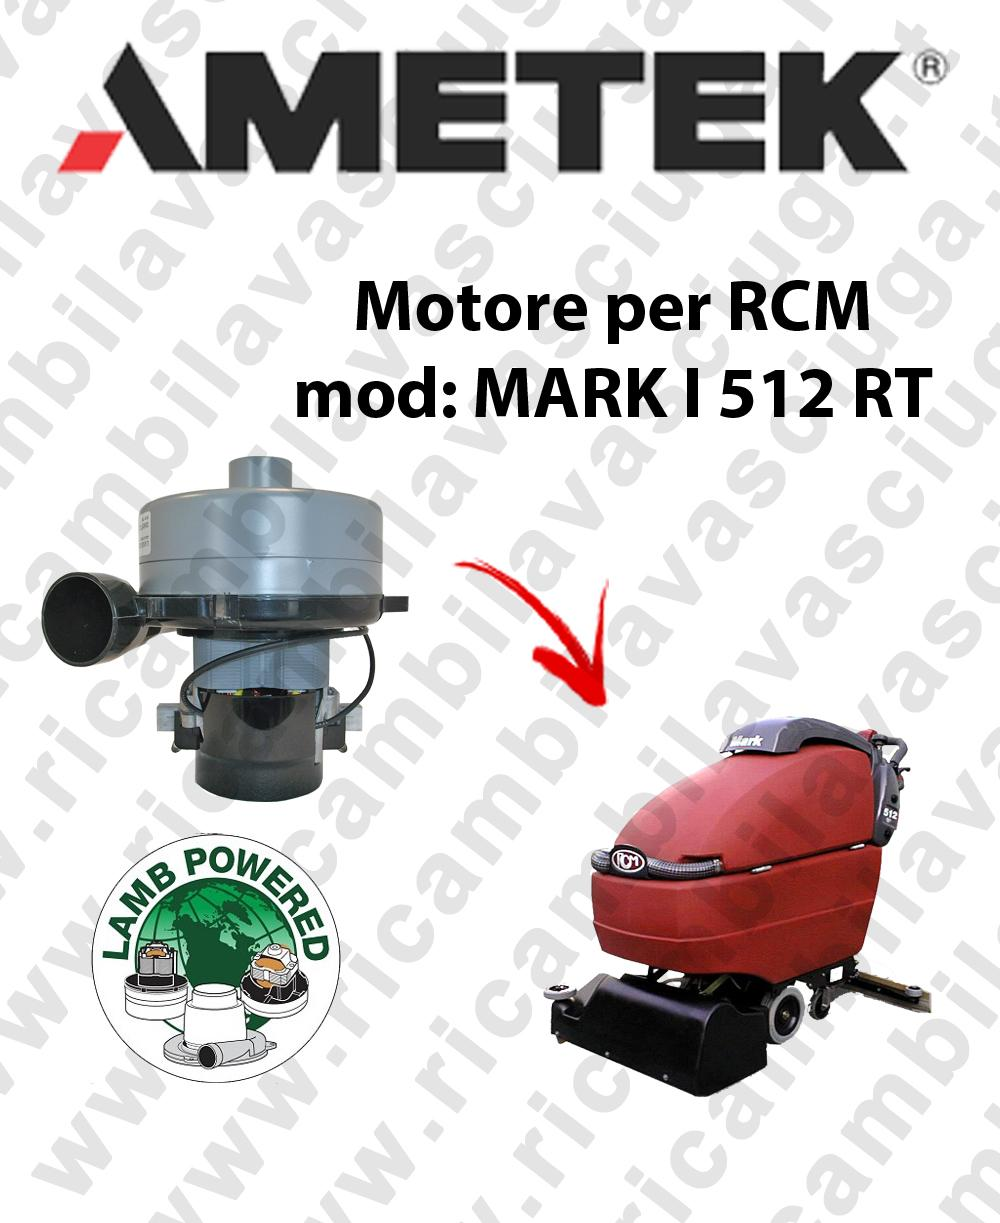 MARK I 512 RT Saugmotor LAMB AMETEK für scheuersaugmaschinen RCM